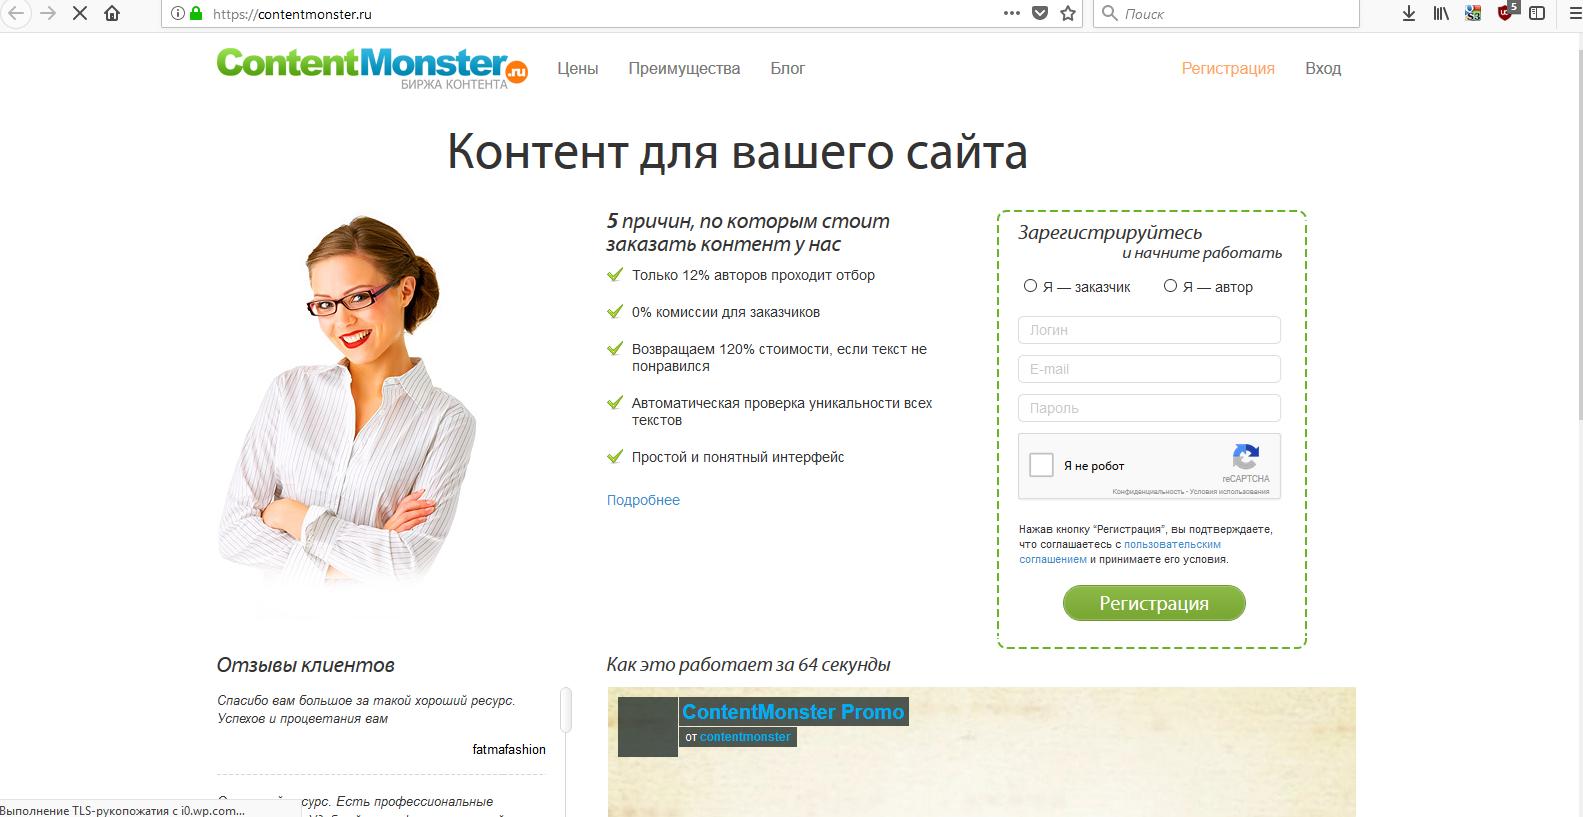 contentmonster-ru